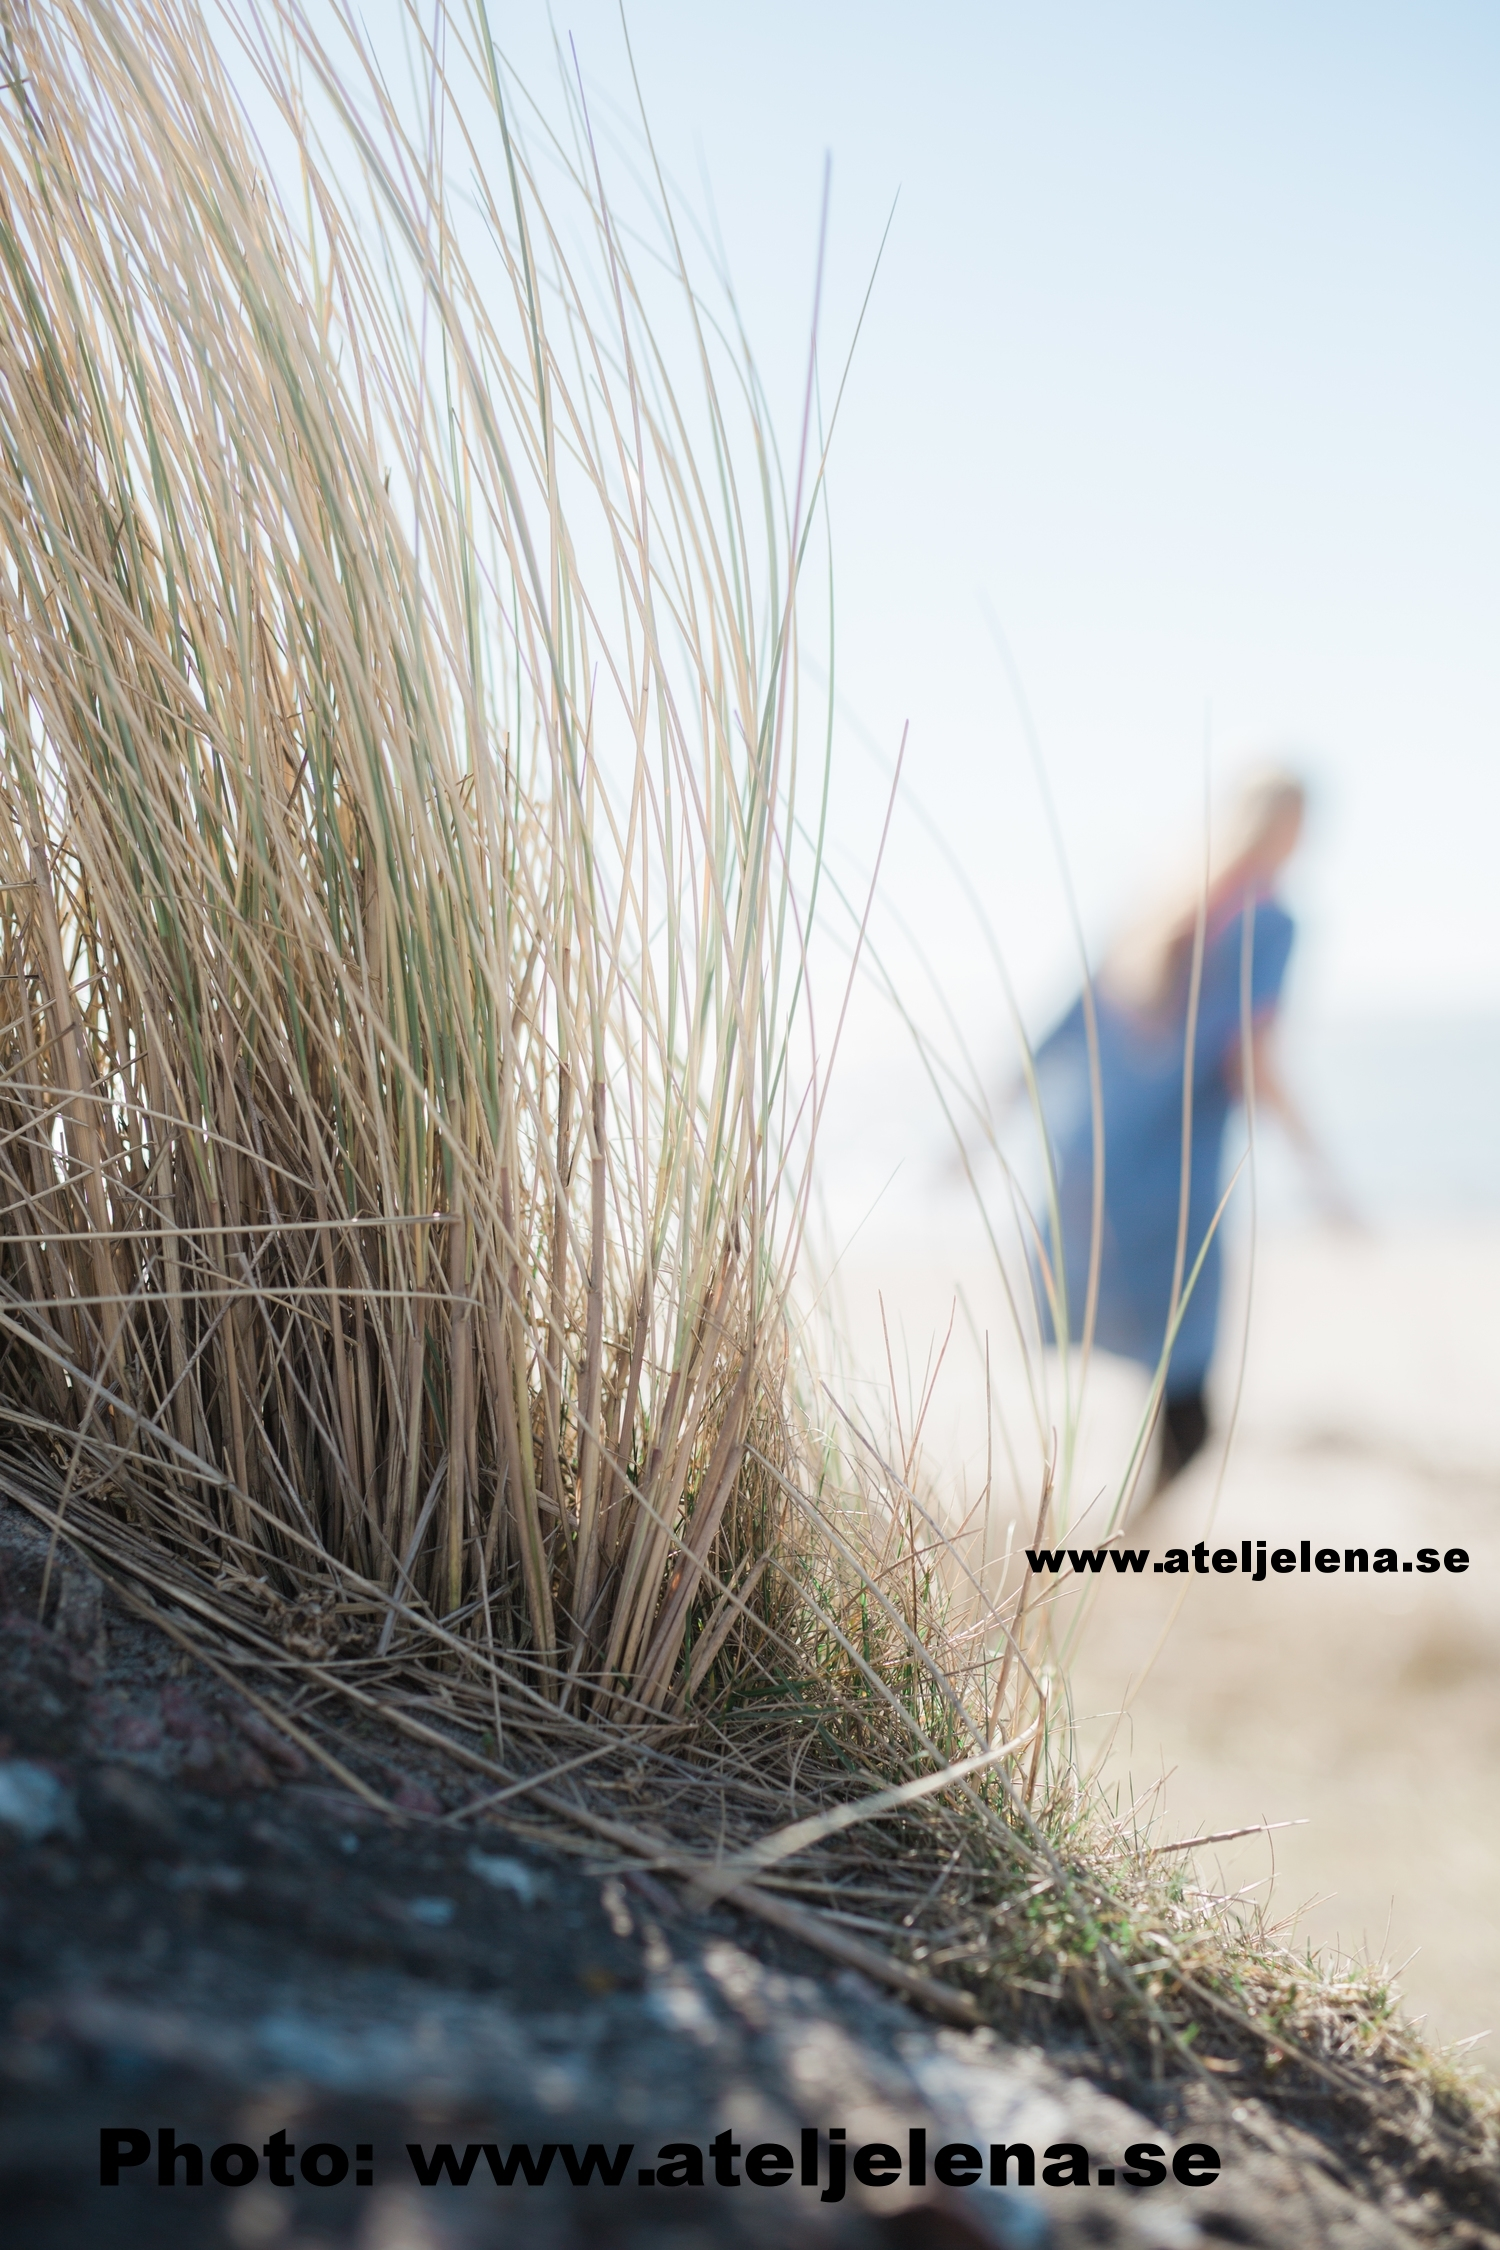 ateljelena-fotograf-sofie-13.jpg